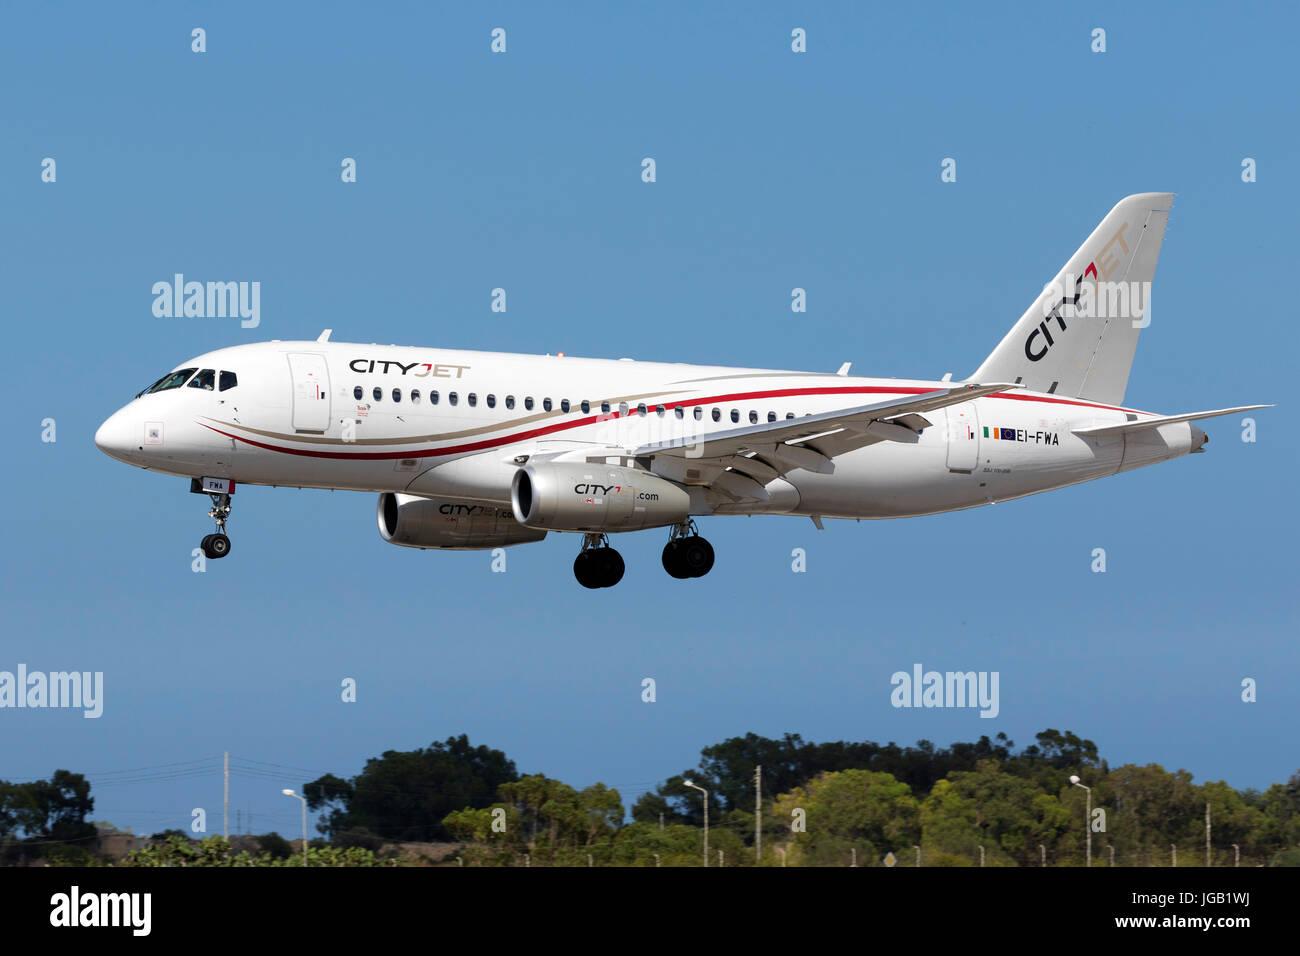 CityJet Sukhoi SSJ-100-95B Superjet 100 (RRJ-95B) [EI-FWA] landing runway 31, arriving from the UK. - Stock Image